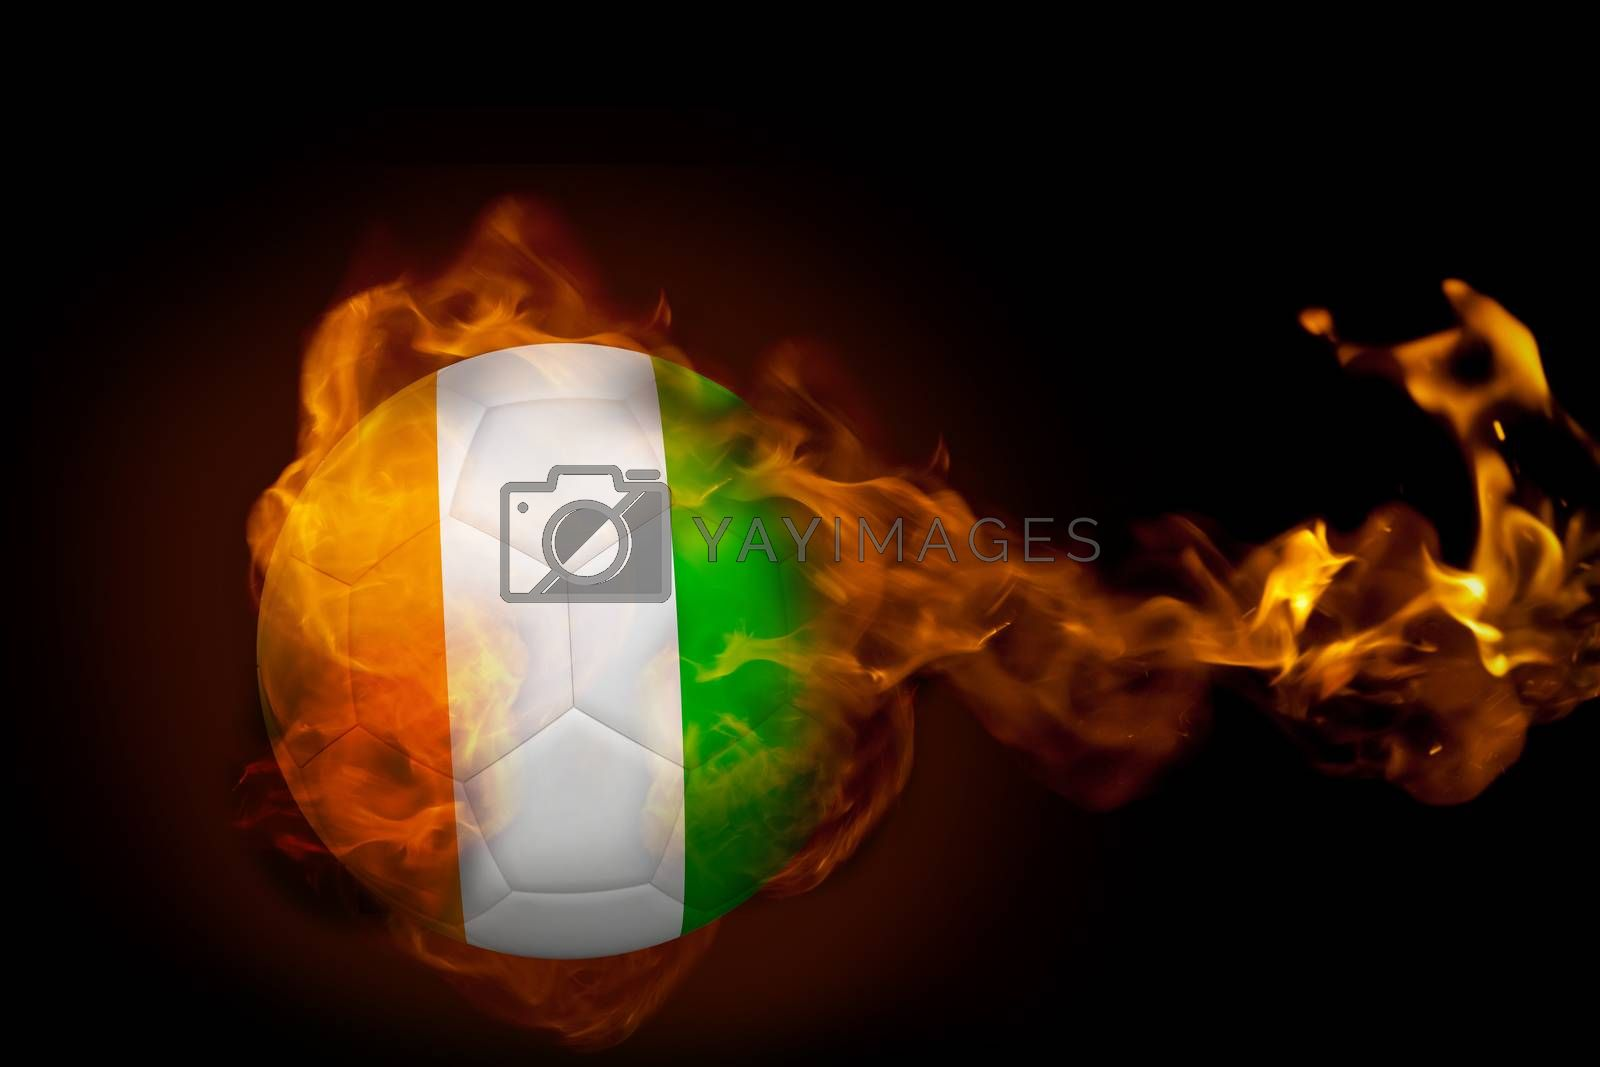 Fire surrounding ivory coast ball by Wavebreakmedia